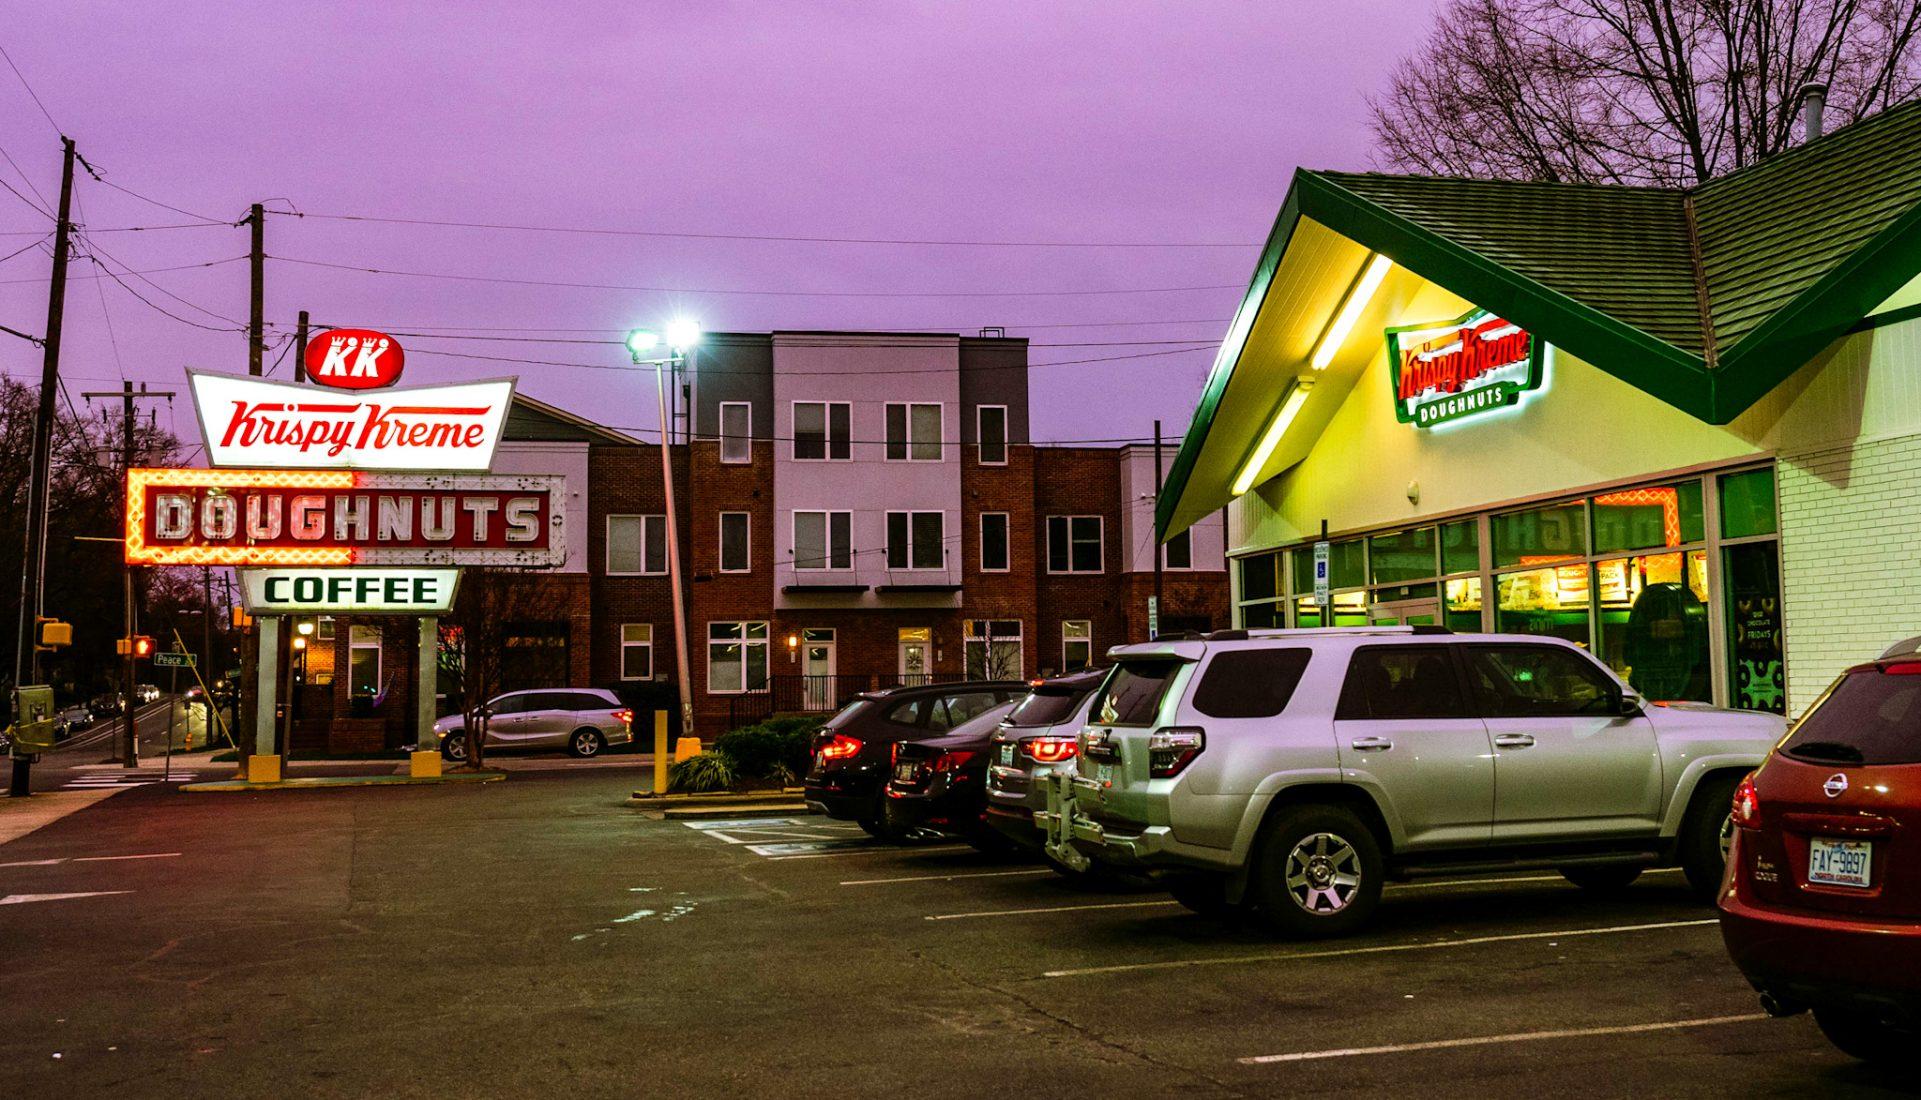 Krispy Kreme – the Original